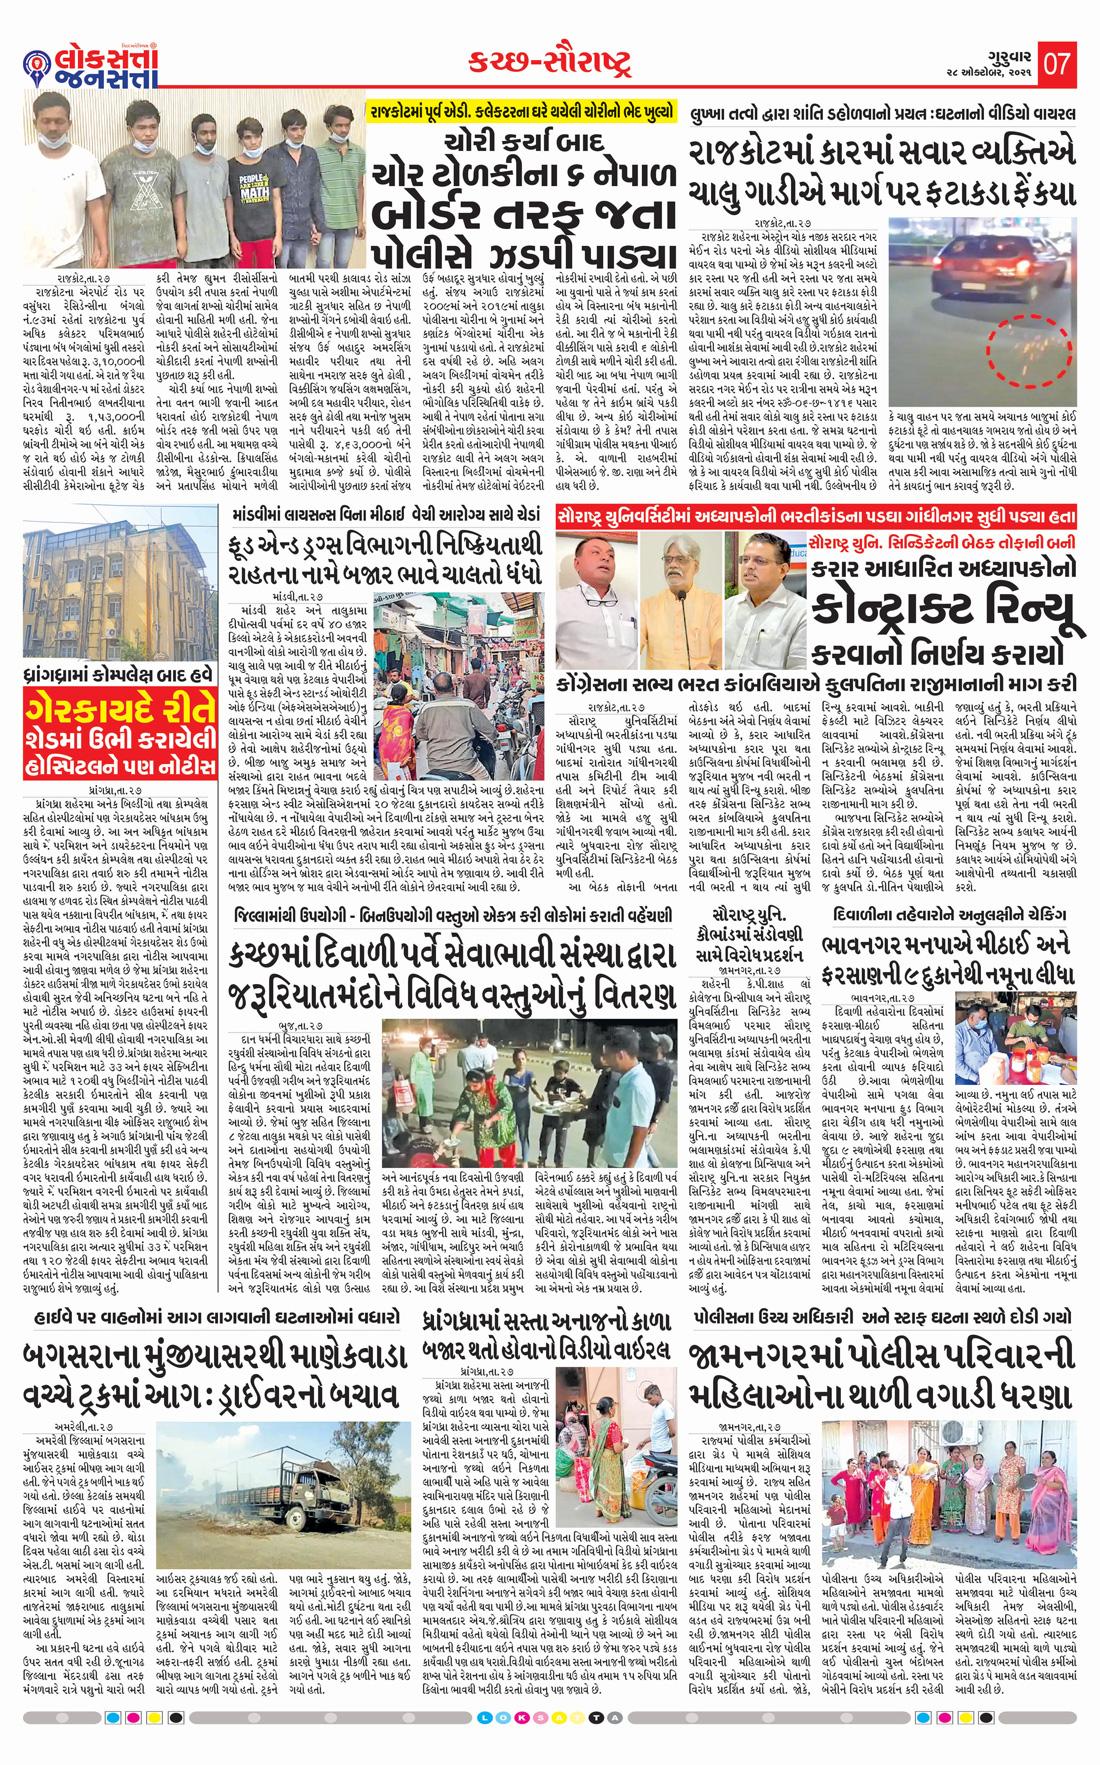 Loksatta Jansatta News Papaer E-paper dated 2021-10-28   Page 7